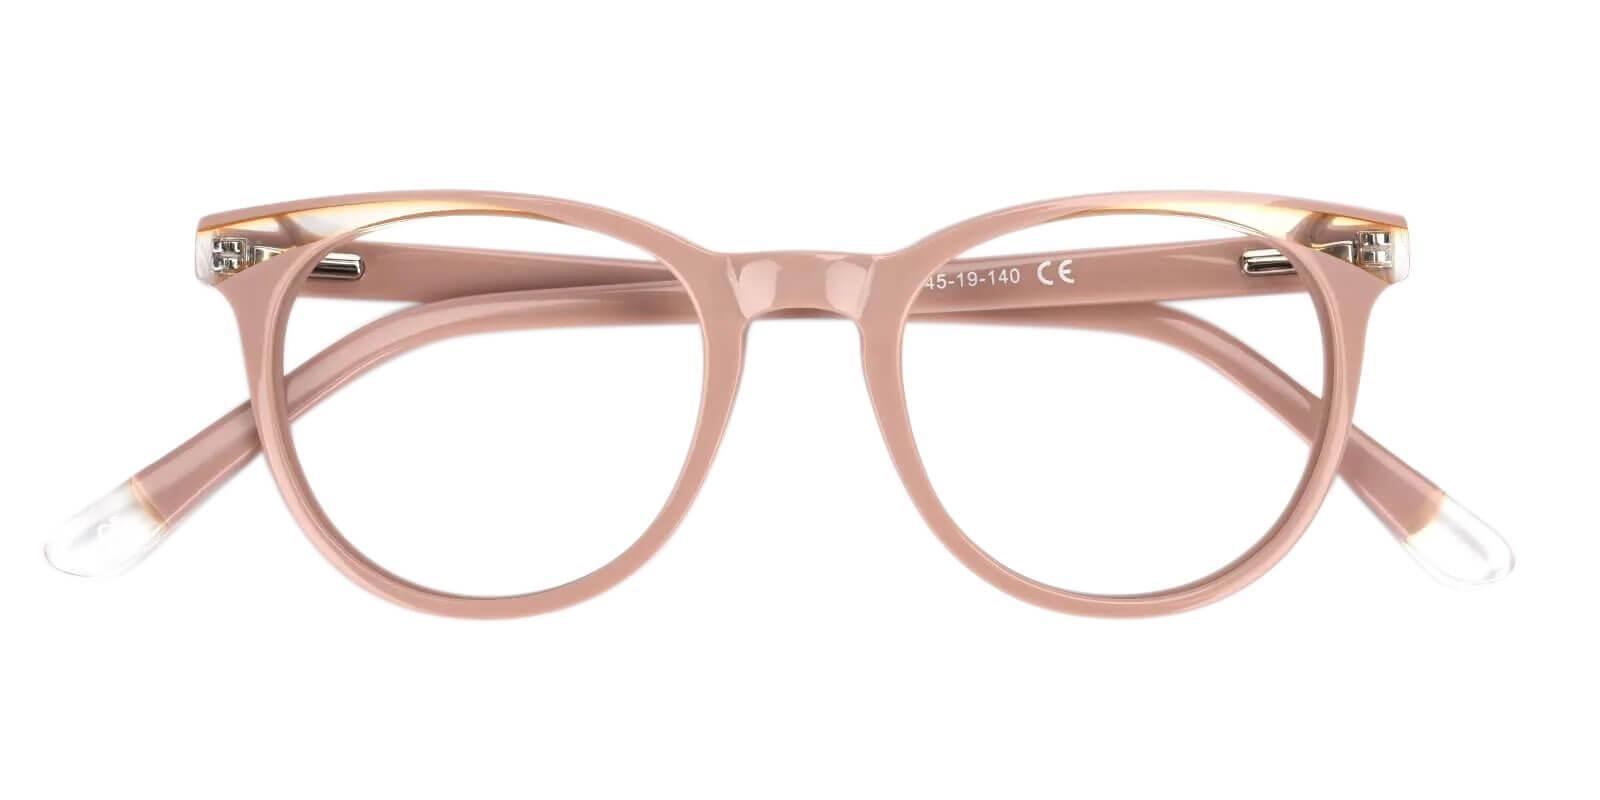 Dimona Pink Acetate Eyeglasses , UniversalBridgeFit Frames from ABBE Glasses